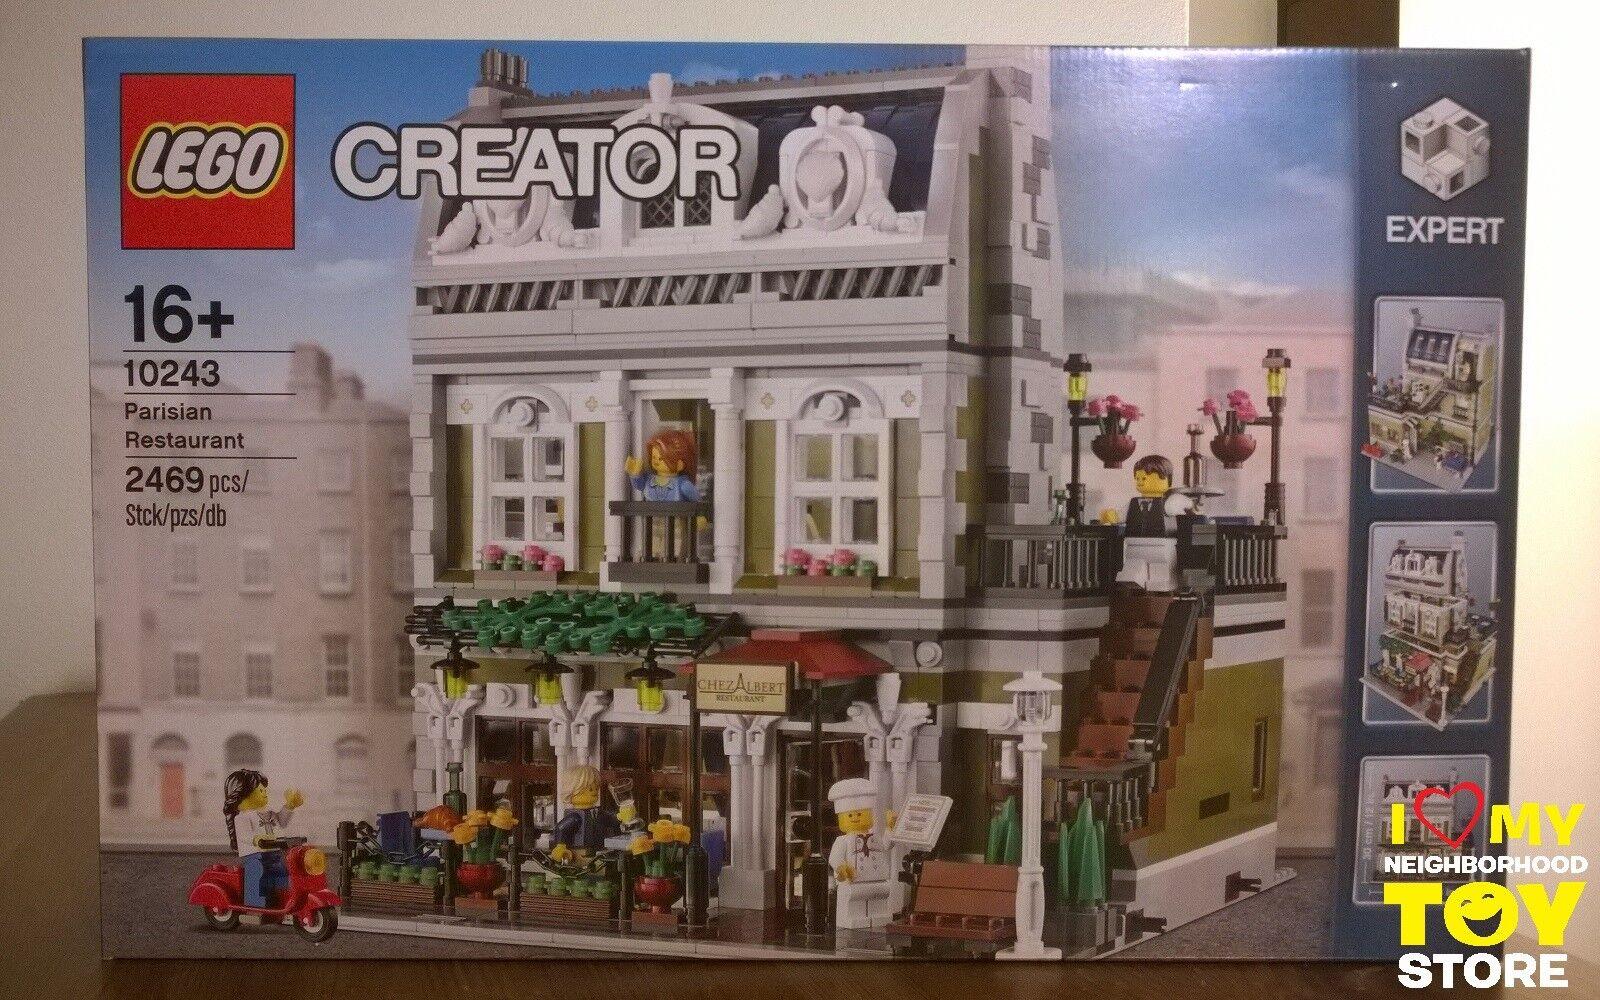 IN STOCK - LEGO 10243 CREATOR EXPERT PARISIAN RESTAURANT (2014) - MISB